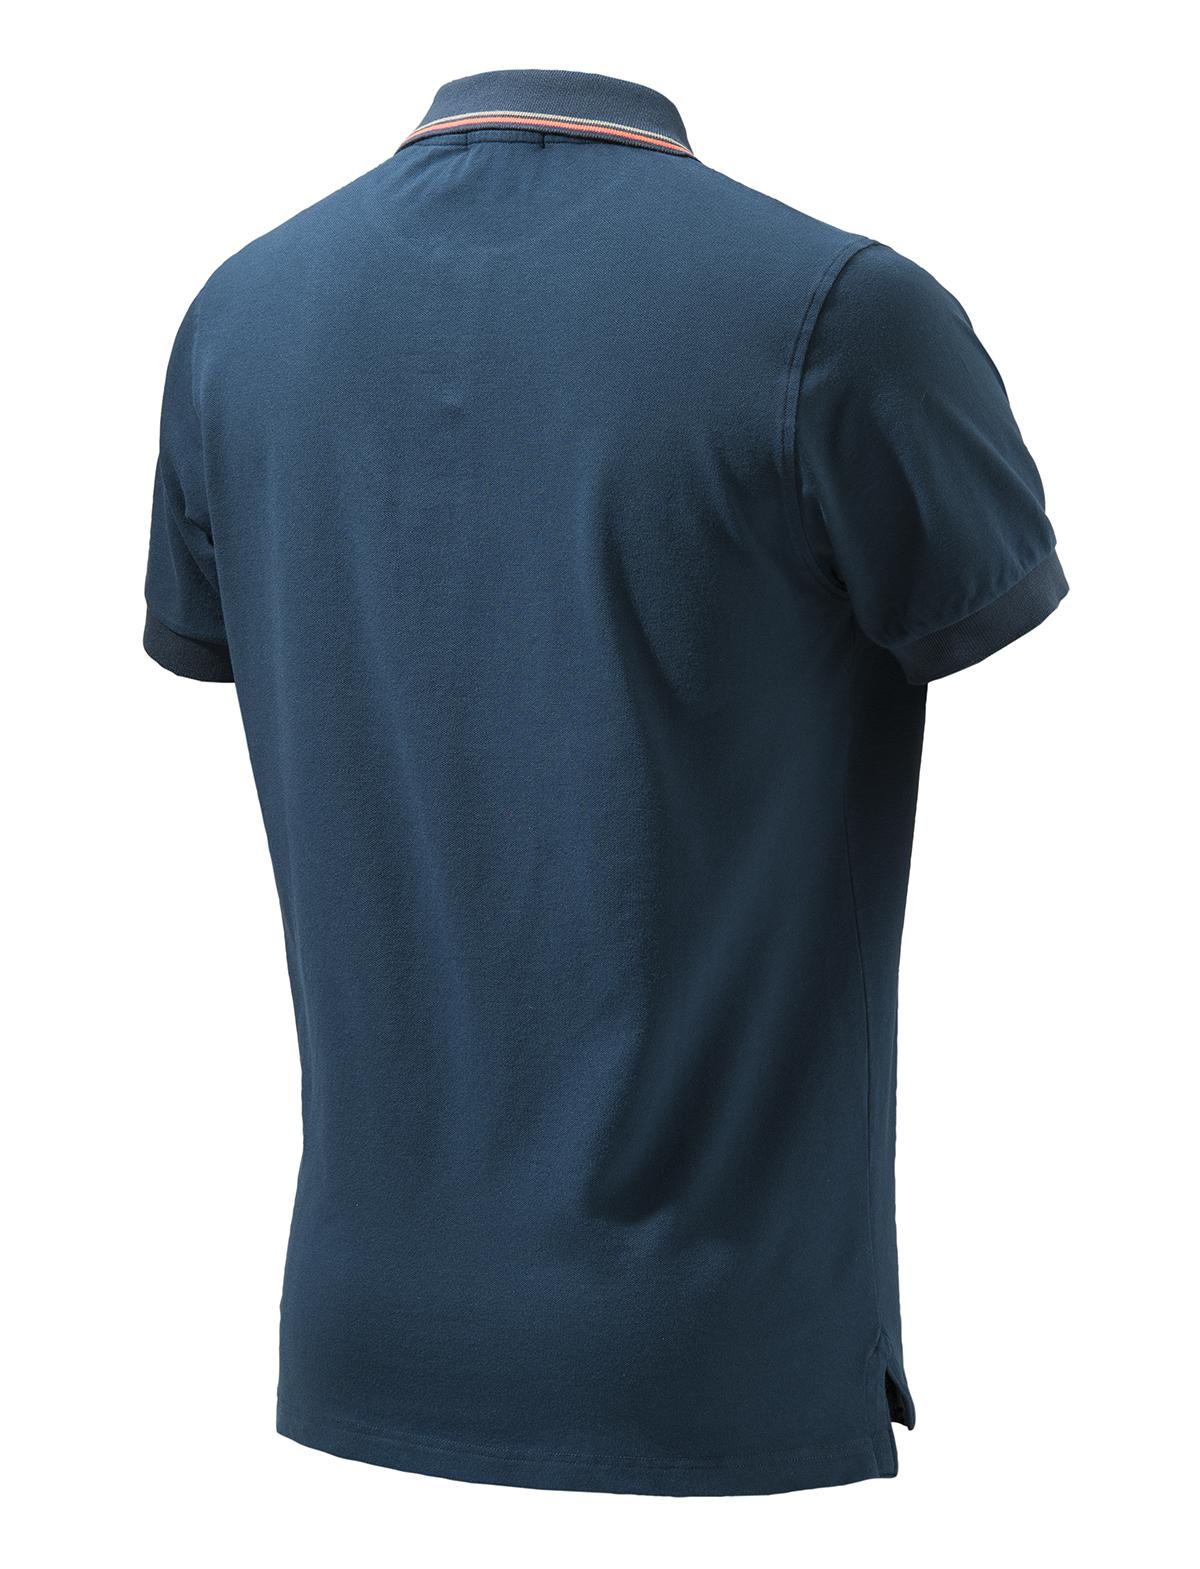 MP411T13540504 Beretta Culture Polo Short Sleeve Blue Back